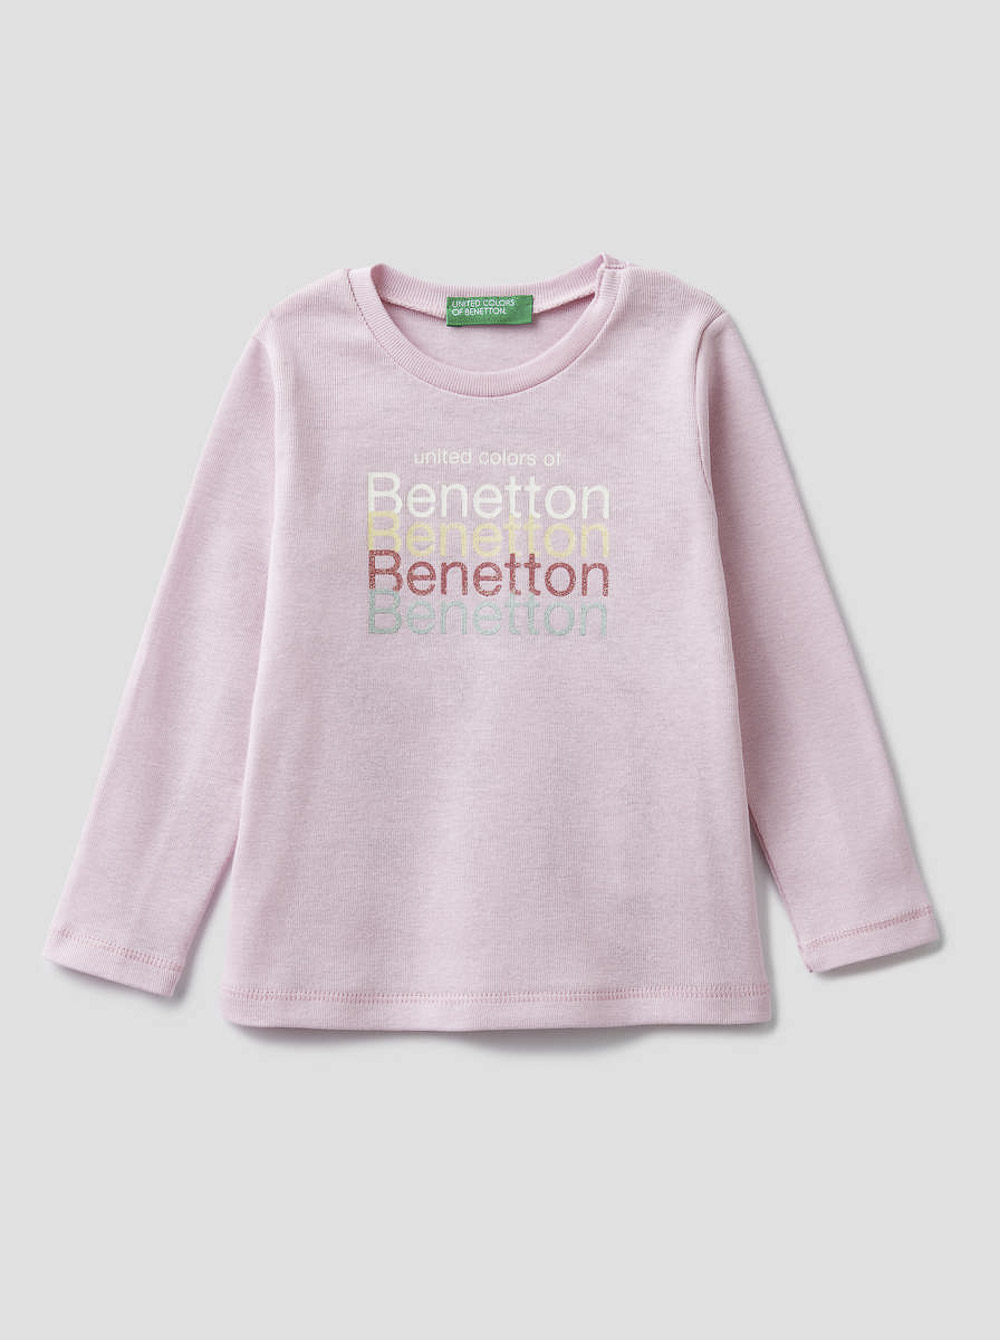 012 BENETTON T-shirt μακρυμάνικο με λογότυπο 3I9WC14QX 20A04A